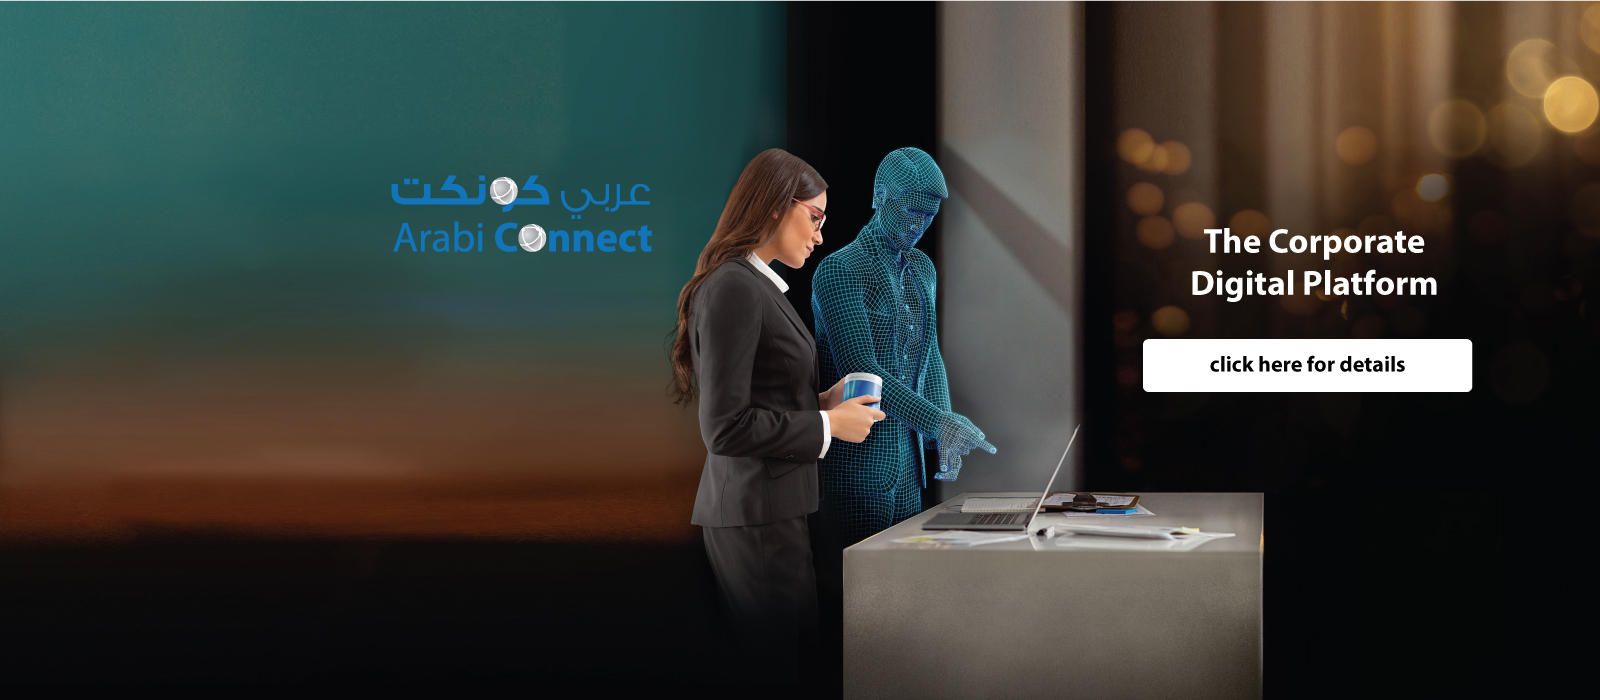 ArabiConnect